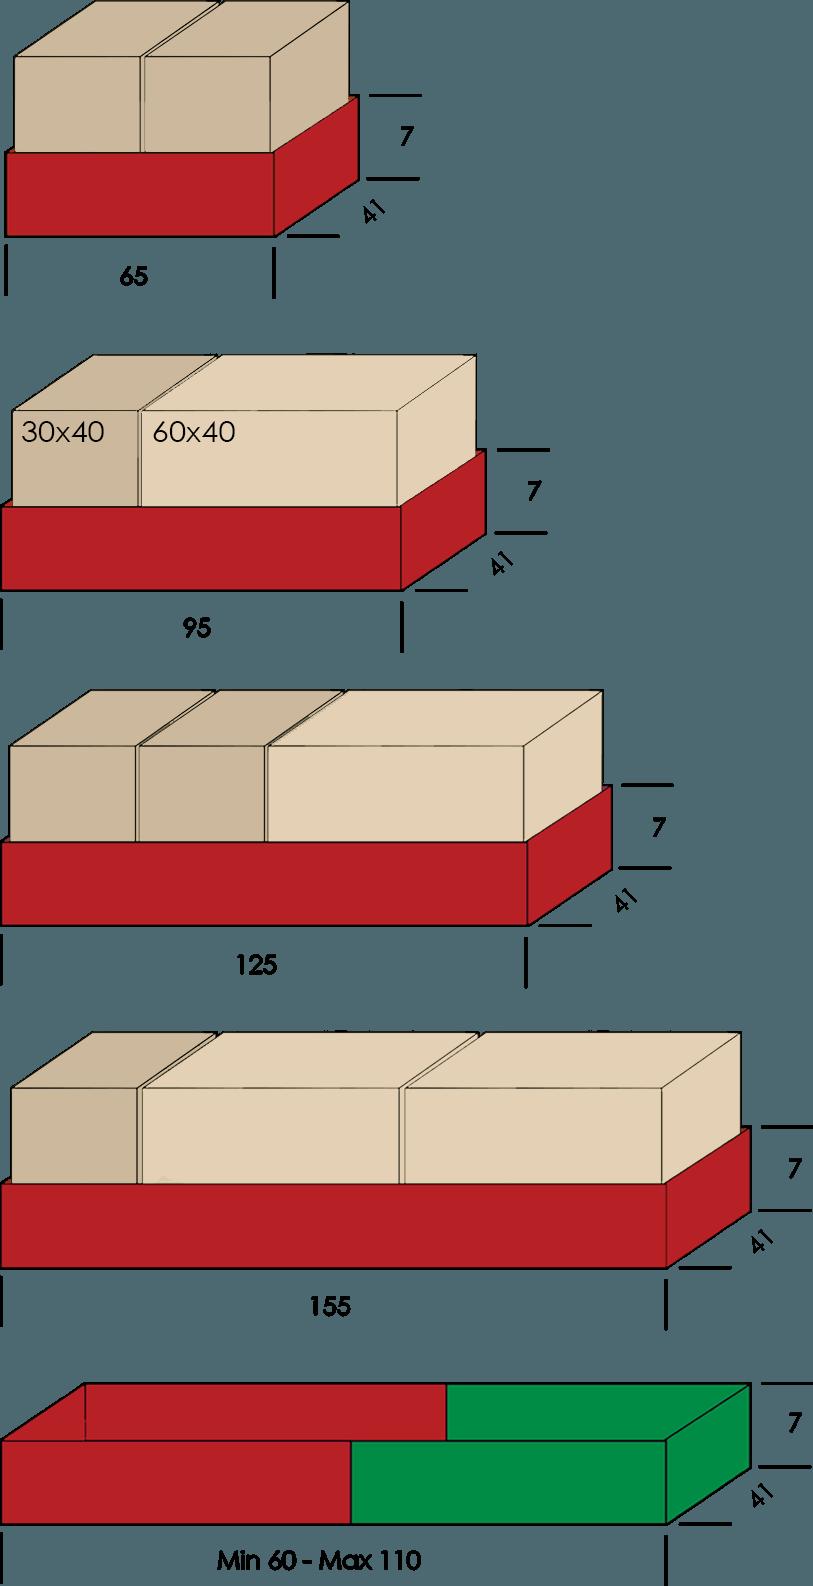 max-width: 400px; display: block; margin-left: auto; margin-right: auto; margin-top: 50px;